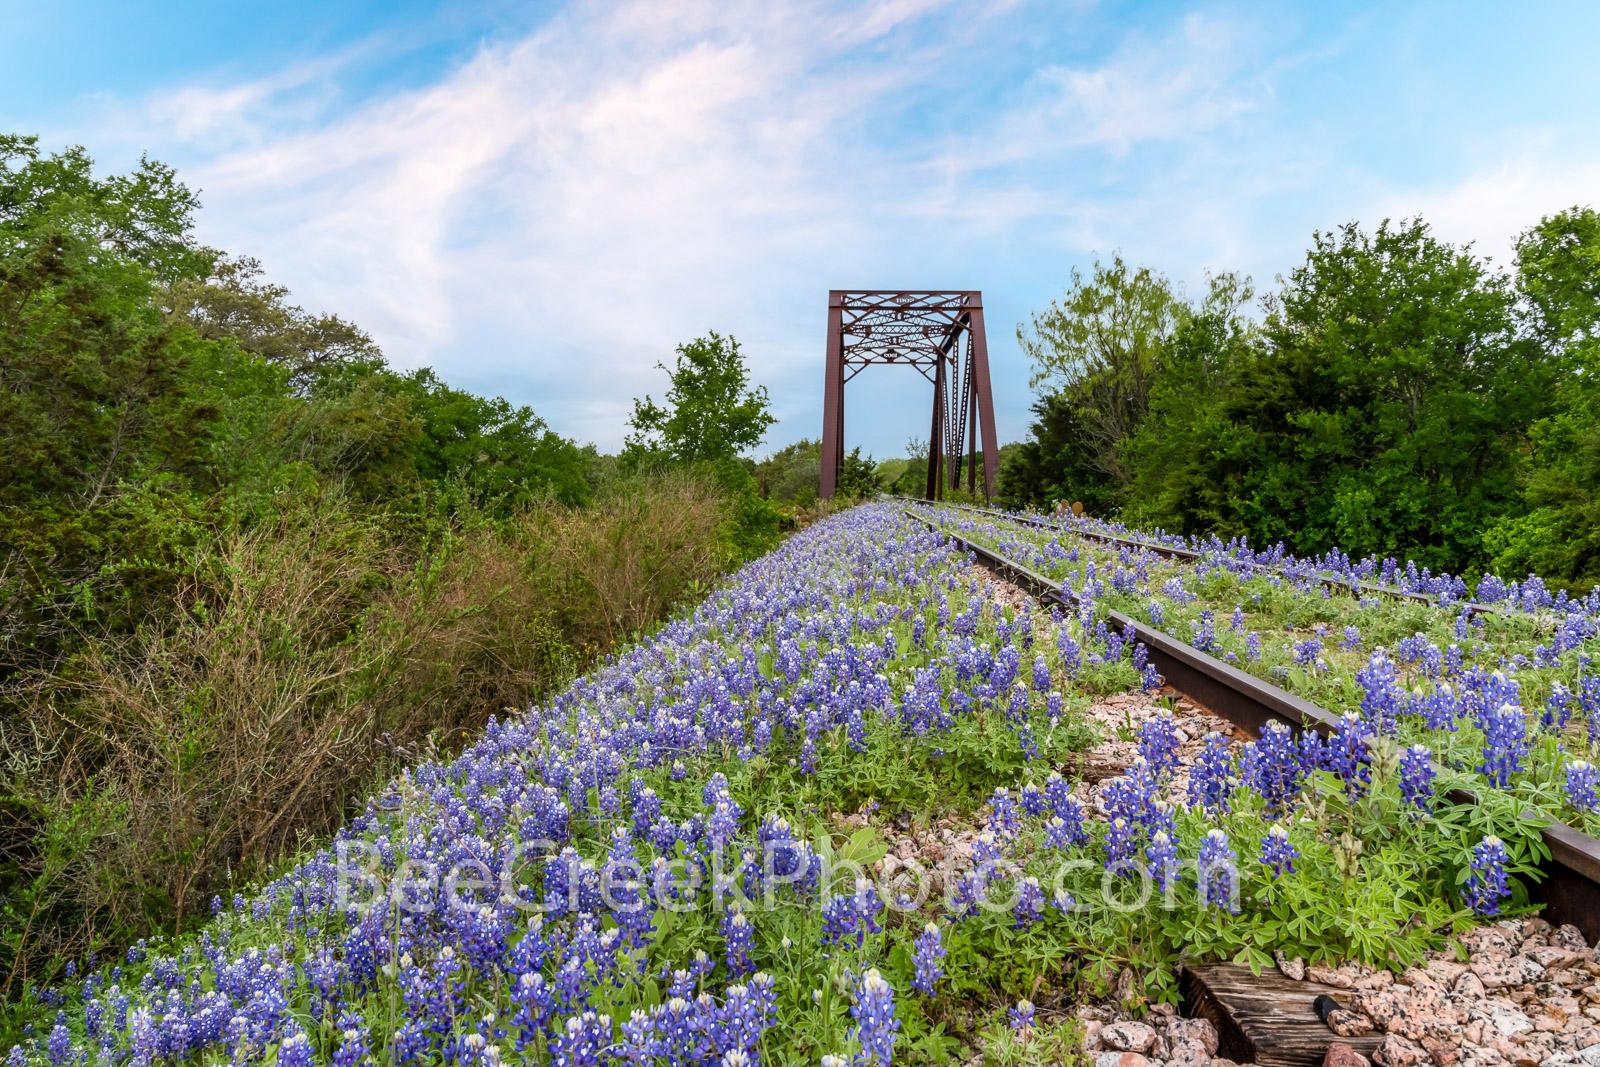 bluebonnets, texas bluebonnets, bluebonnet, track,railroad, railroad track, texas hill country, hill country, texas wildflowers, tressel, blue sky, texas wildflowers, wildflowers, texas lupine, blue s, photo